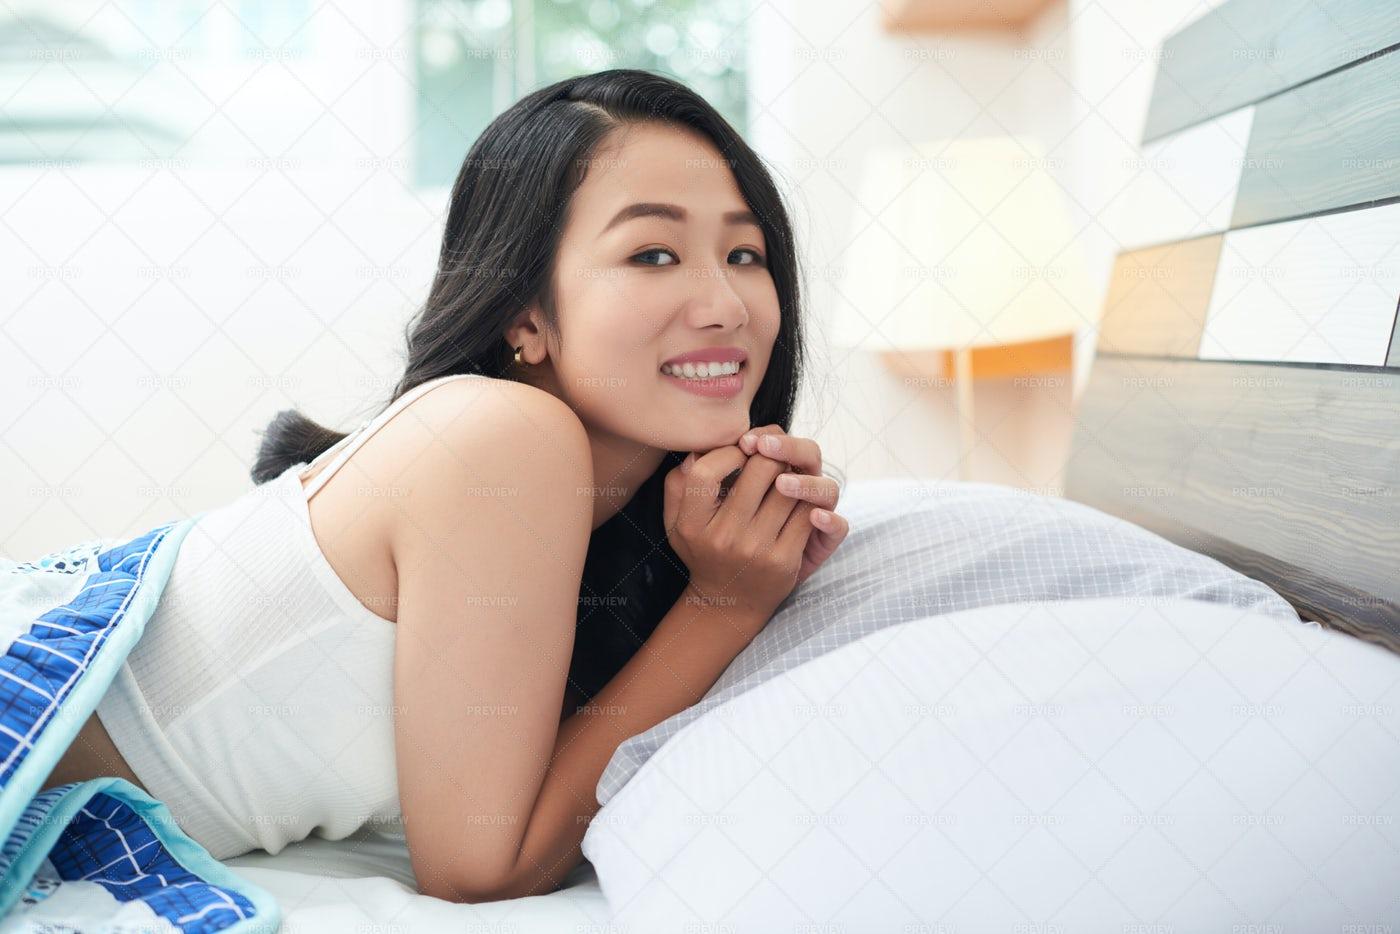 Beautiful Asian Woman Under Blanket...: Stock Photos